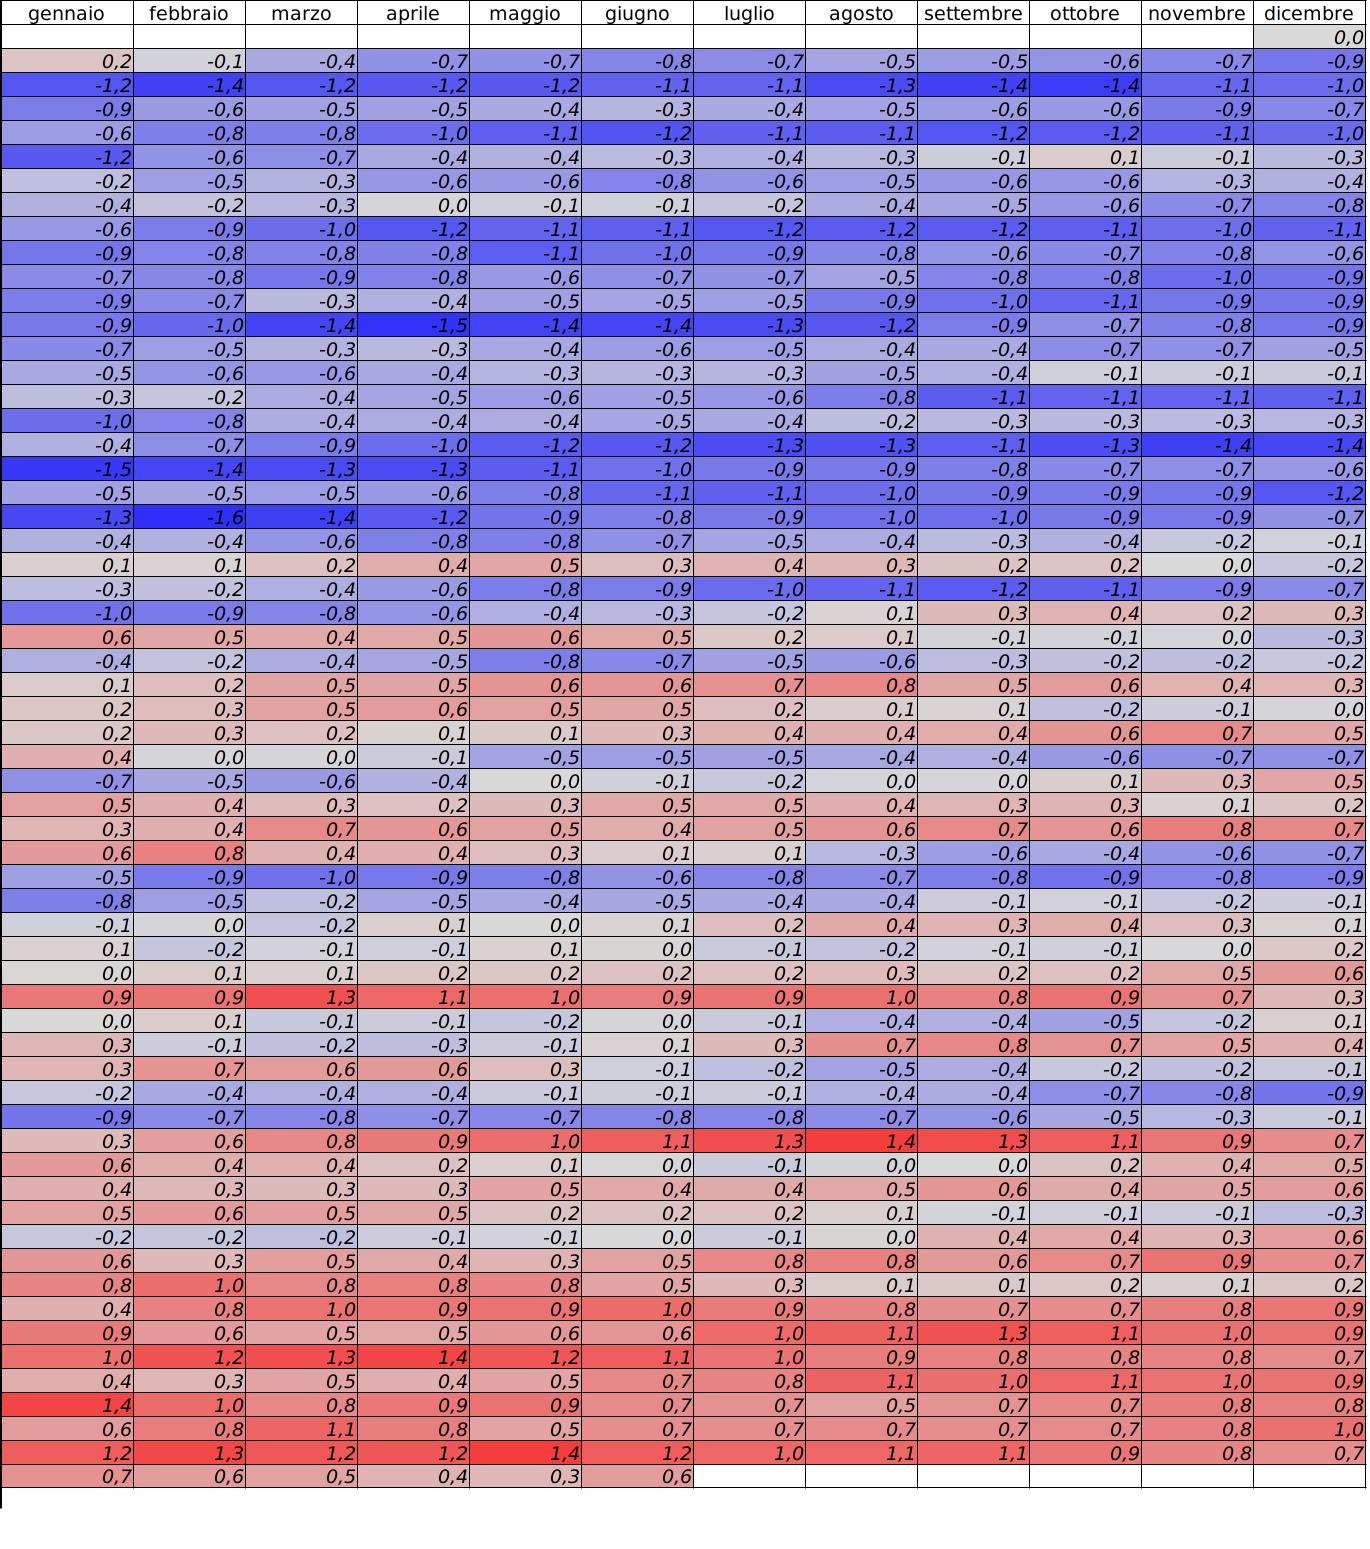 Meteo ASSAM Regione Marche - tabella temperature ultimi 12 mesi